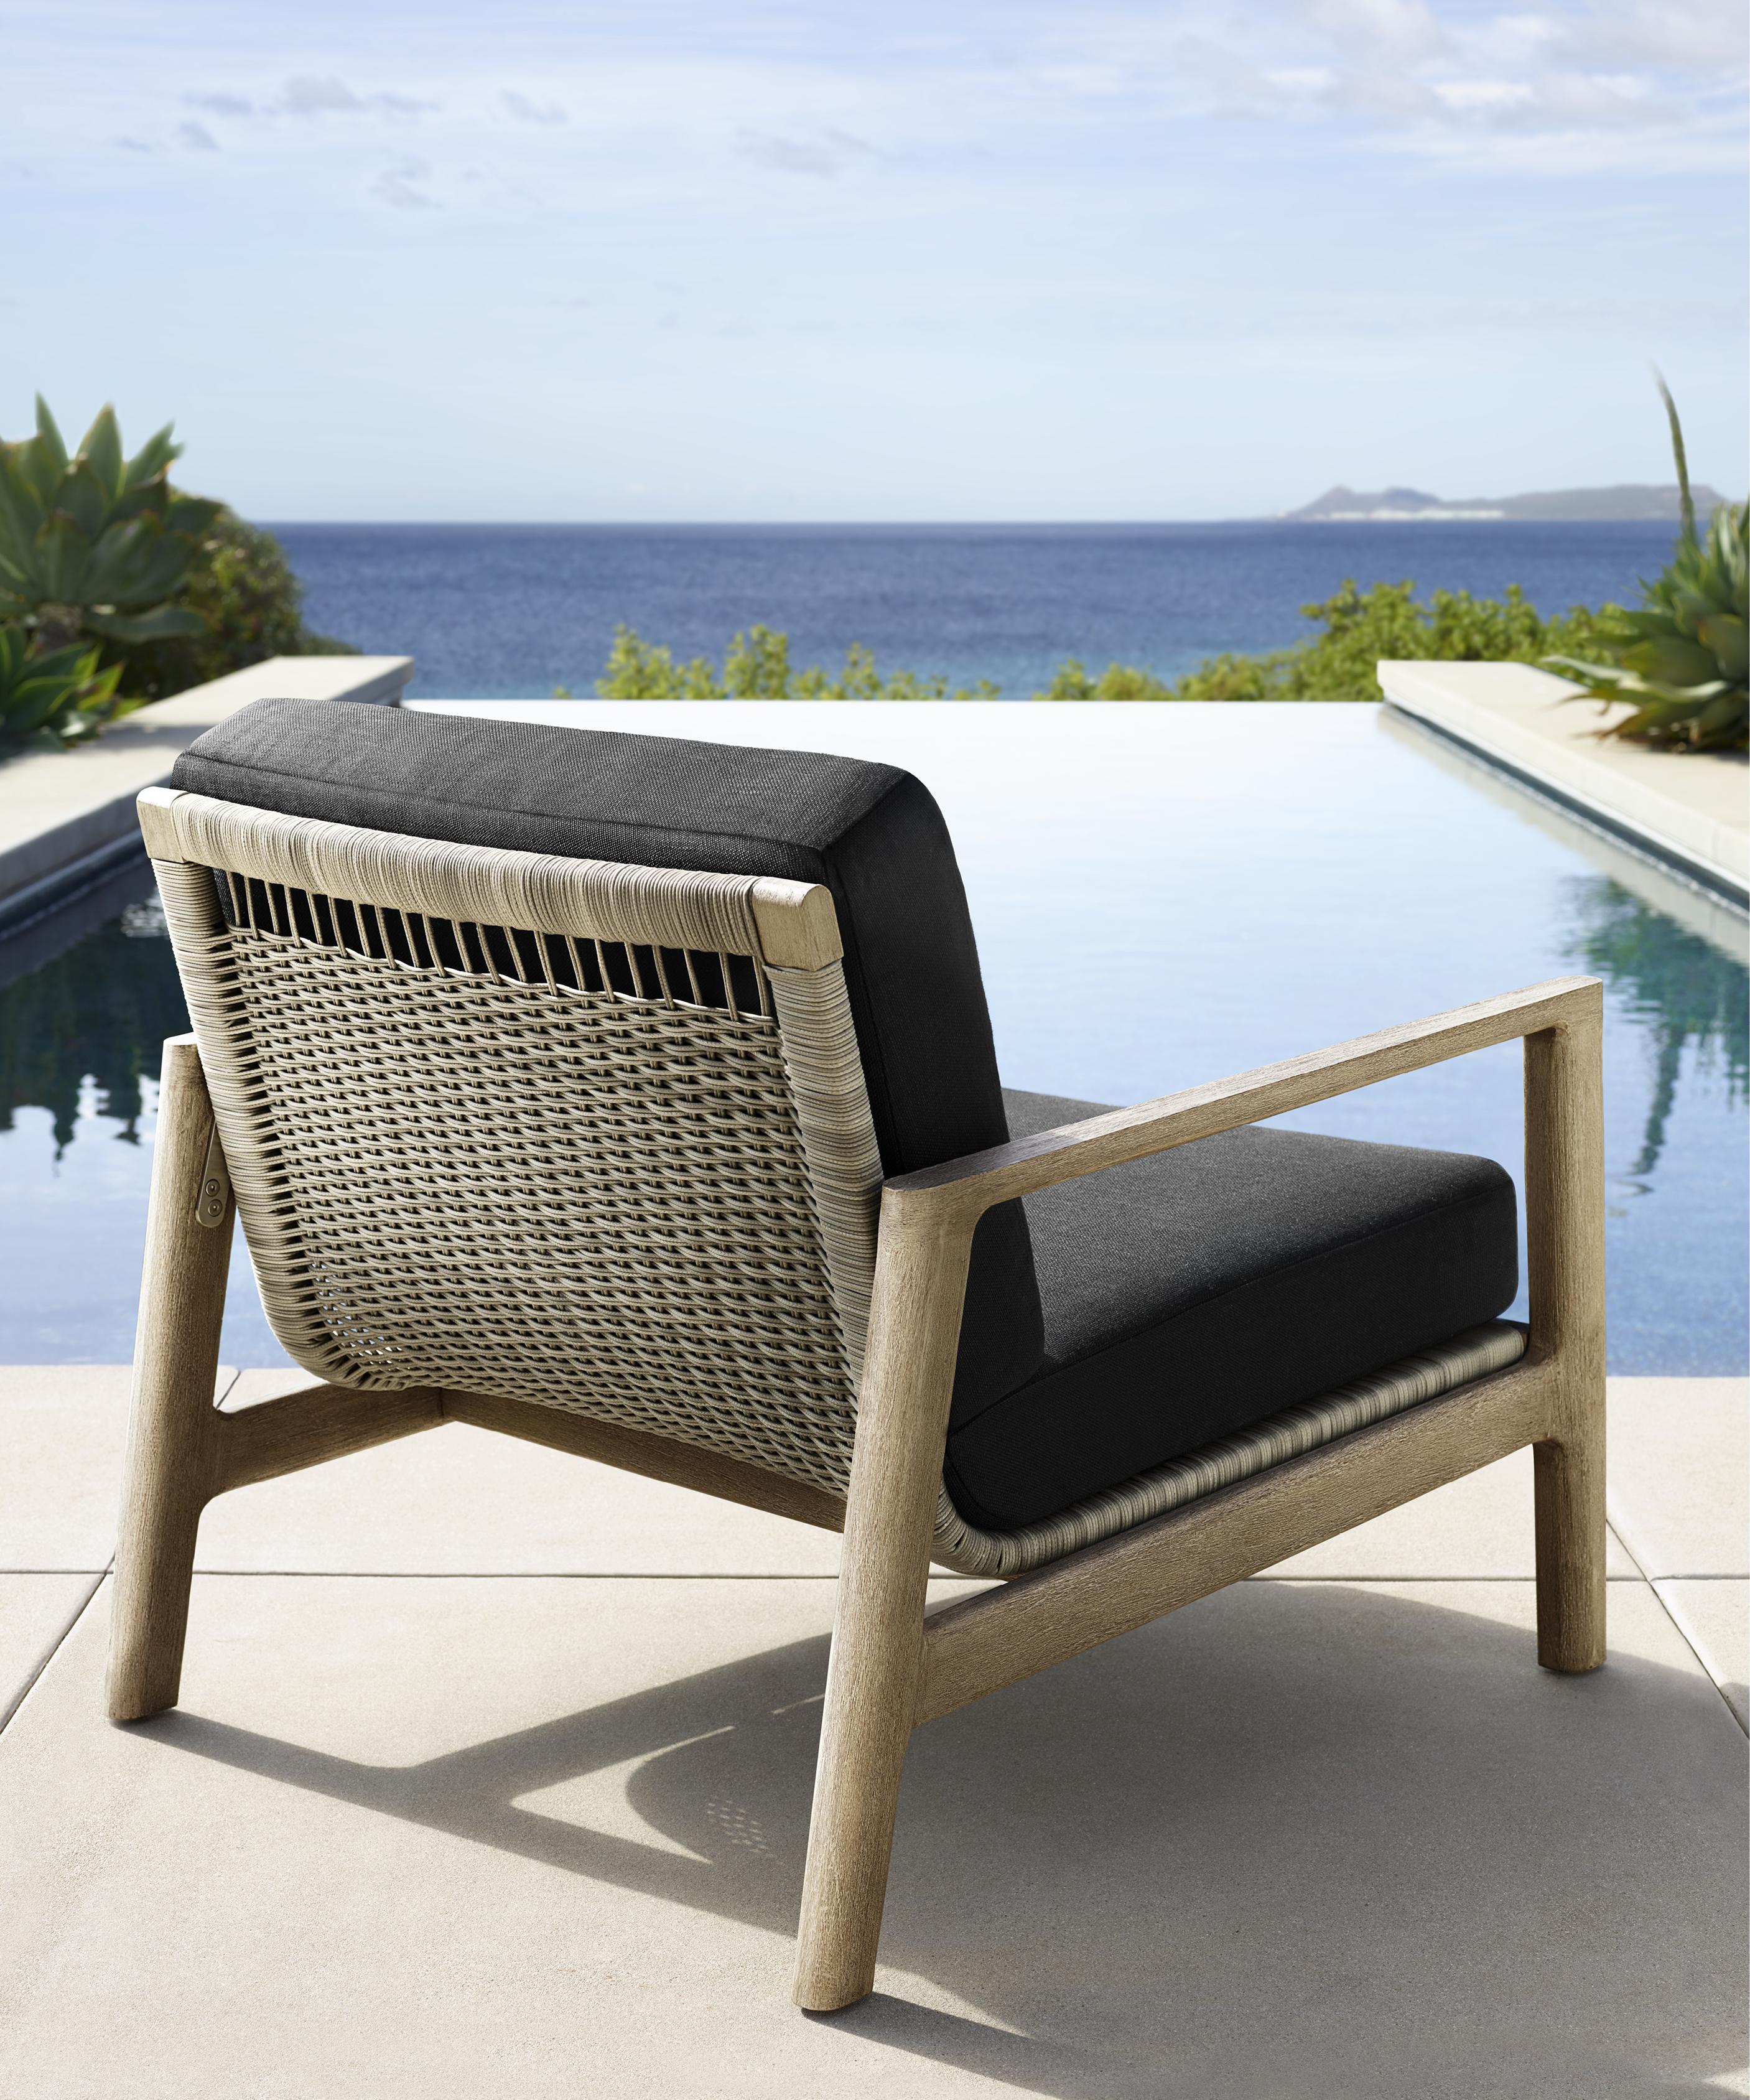 Swell Rh Unveils Outdoor 2019 Collection Business Wire Frankydiablos Diy Chair Ideas Frankydiabloscom